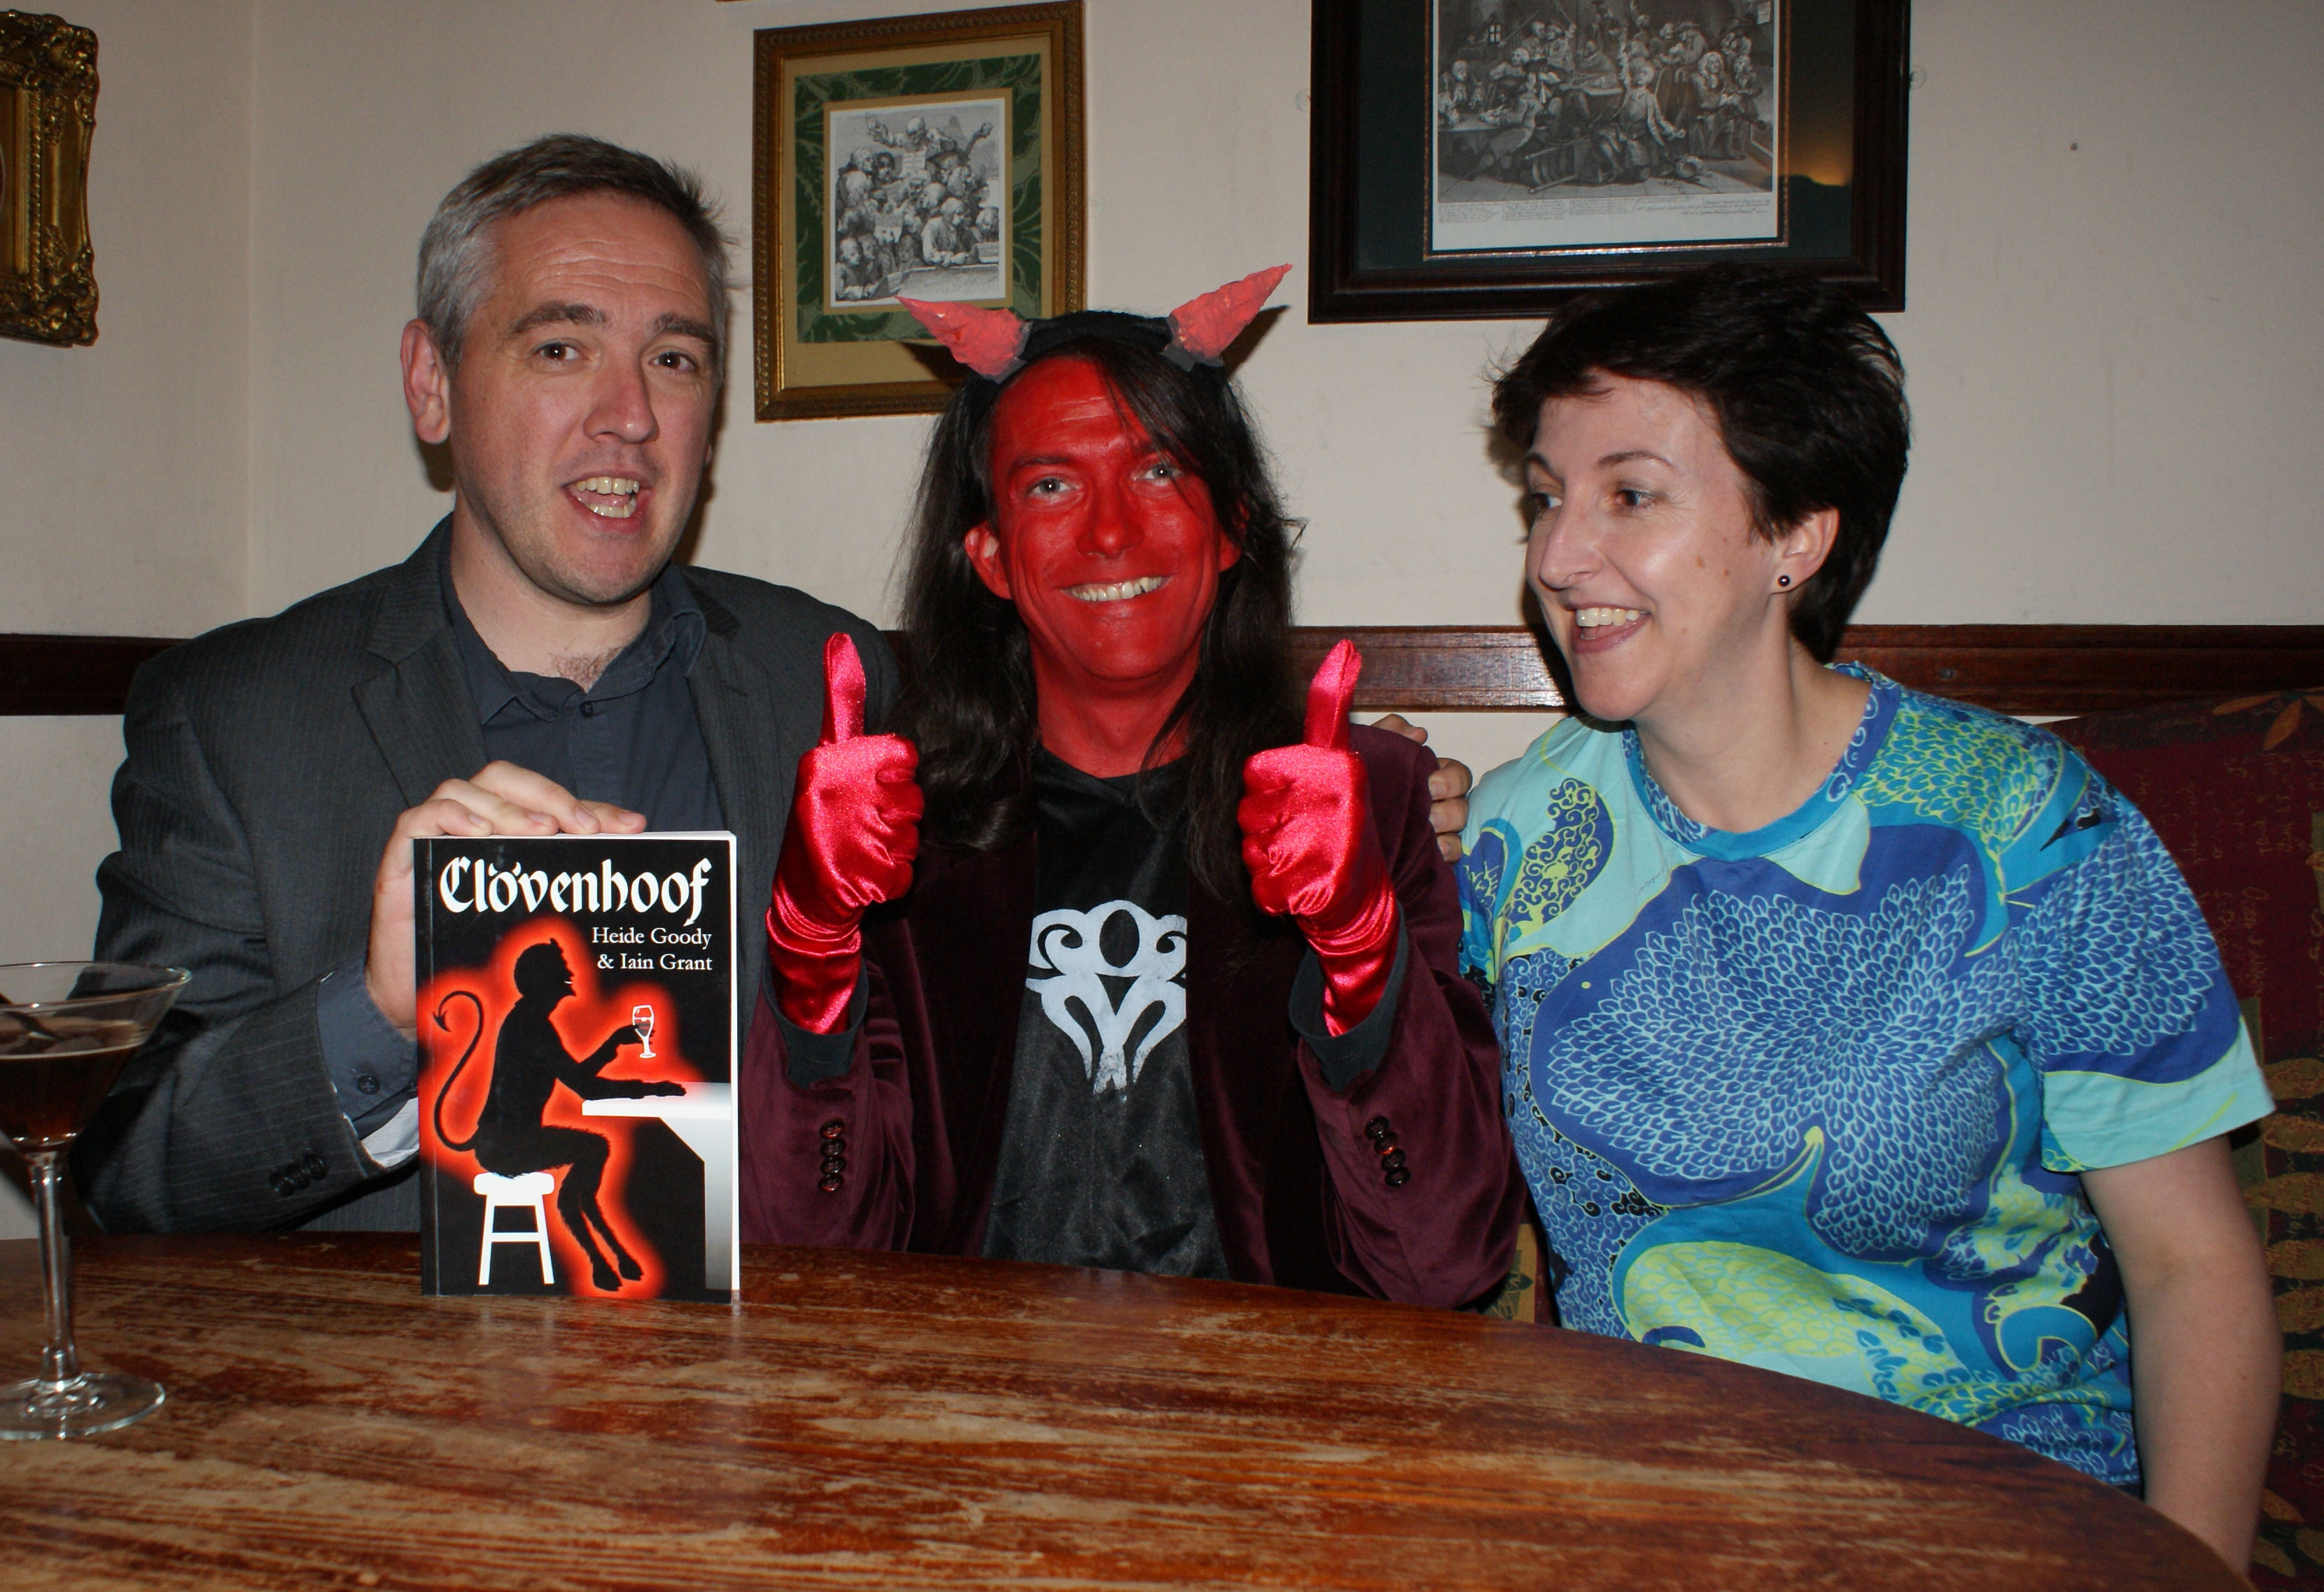 Heide Goody & Iain Grant with Satan